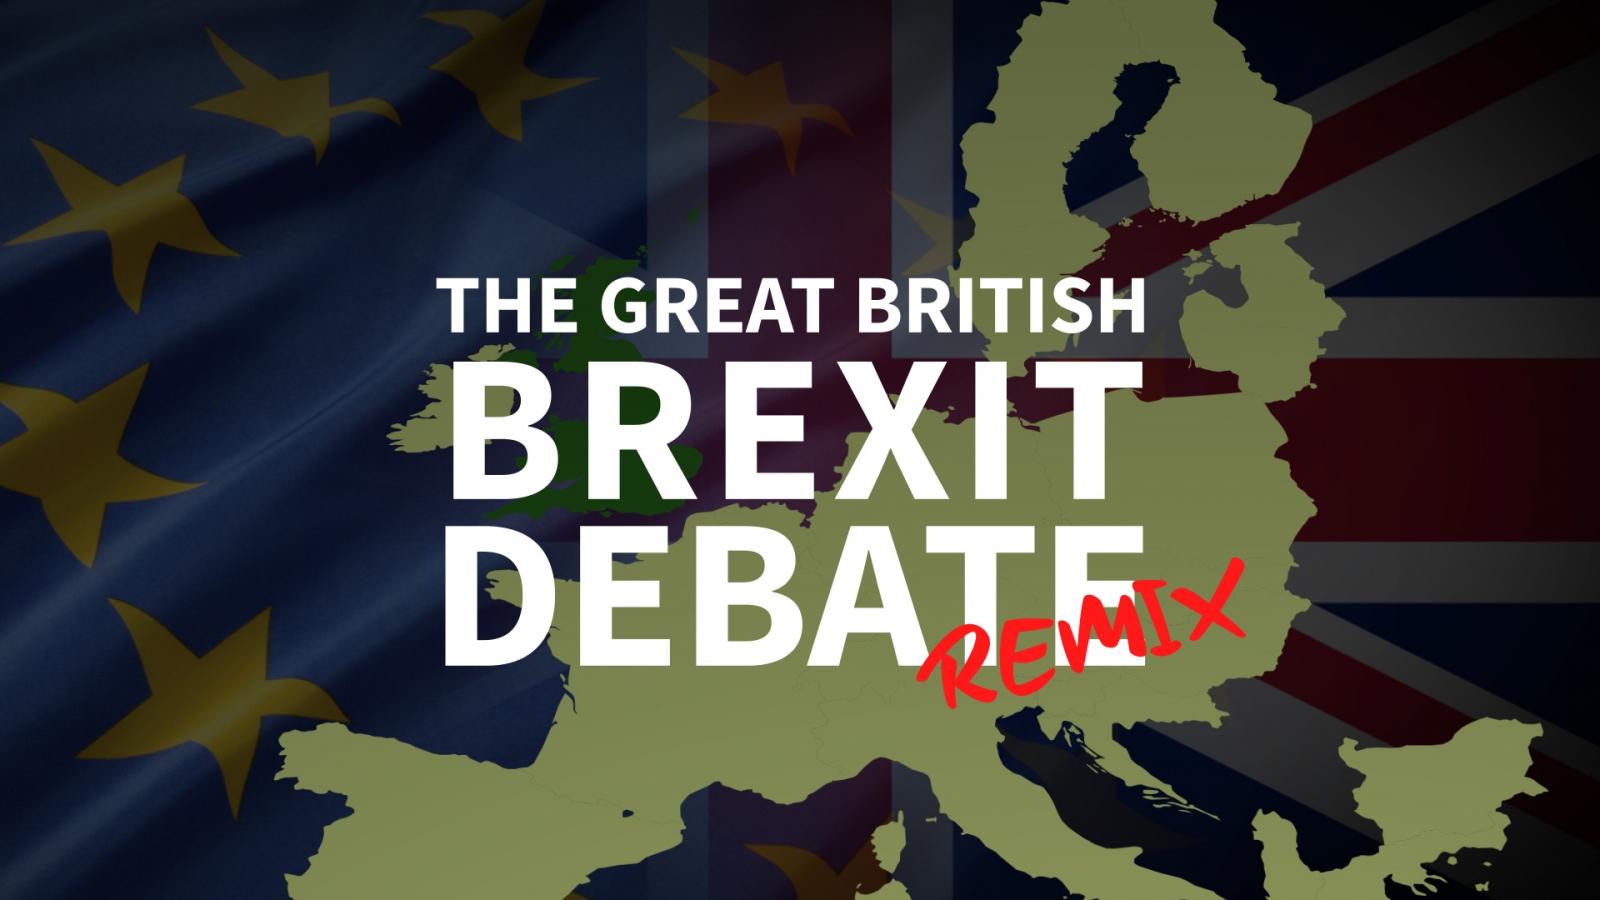 EU referendum remixed: A video mashup of the great British Brexit debate